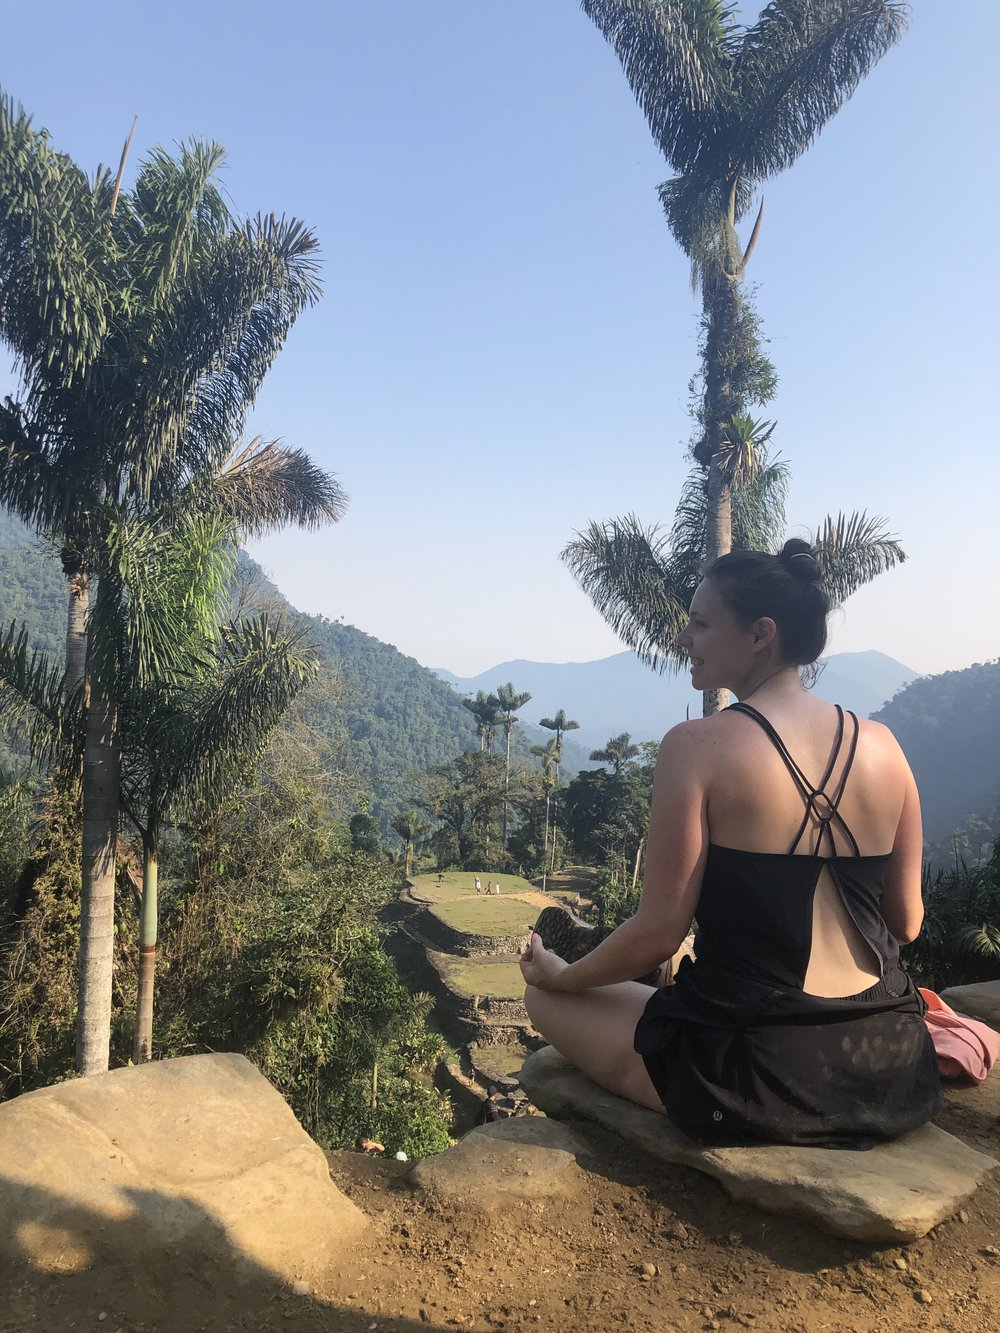 Metta Meditation - Practice Loving Kindness